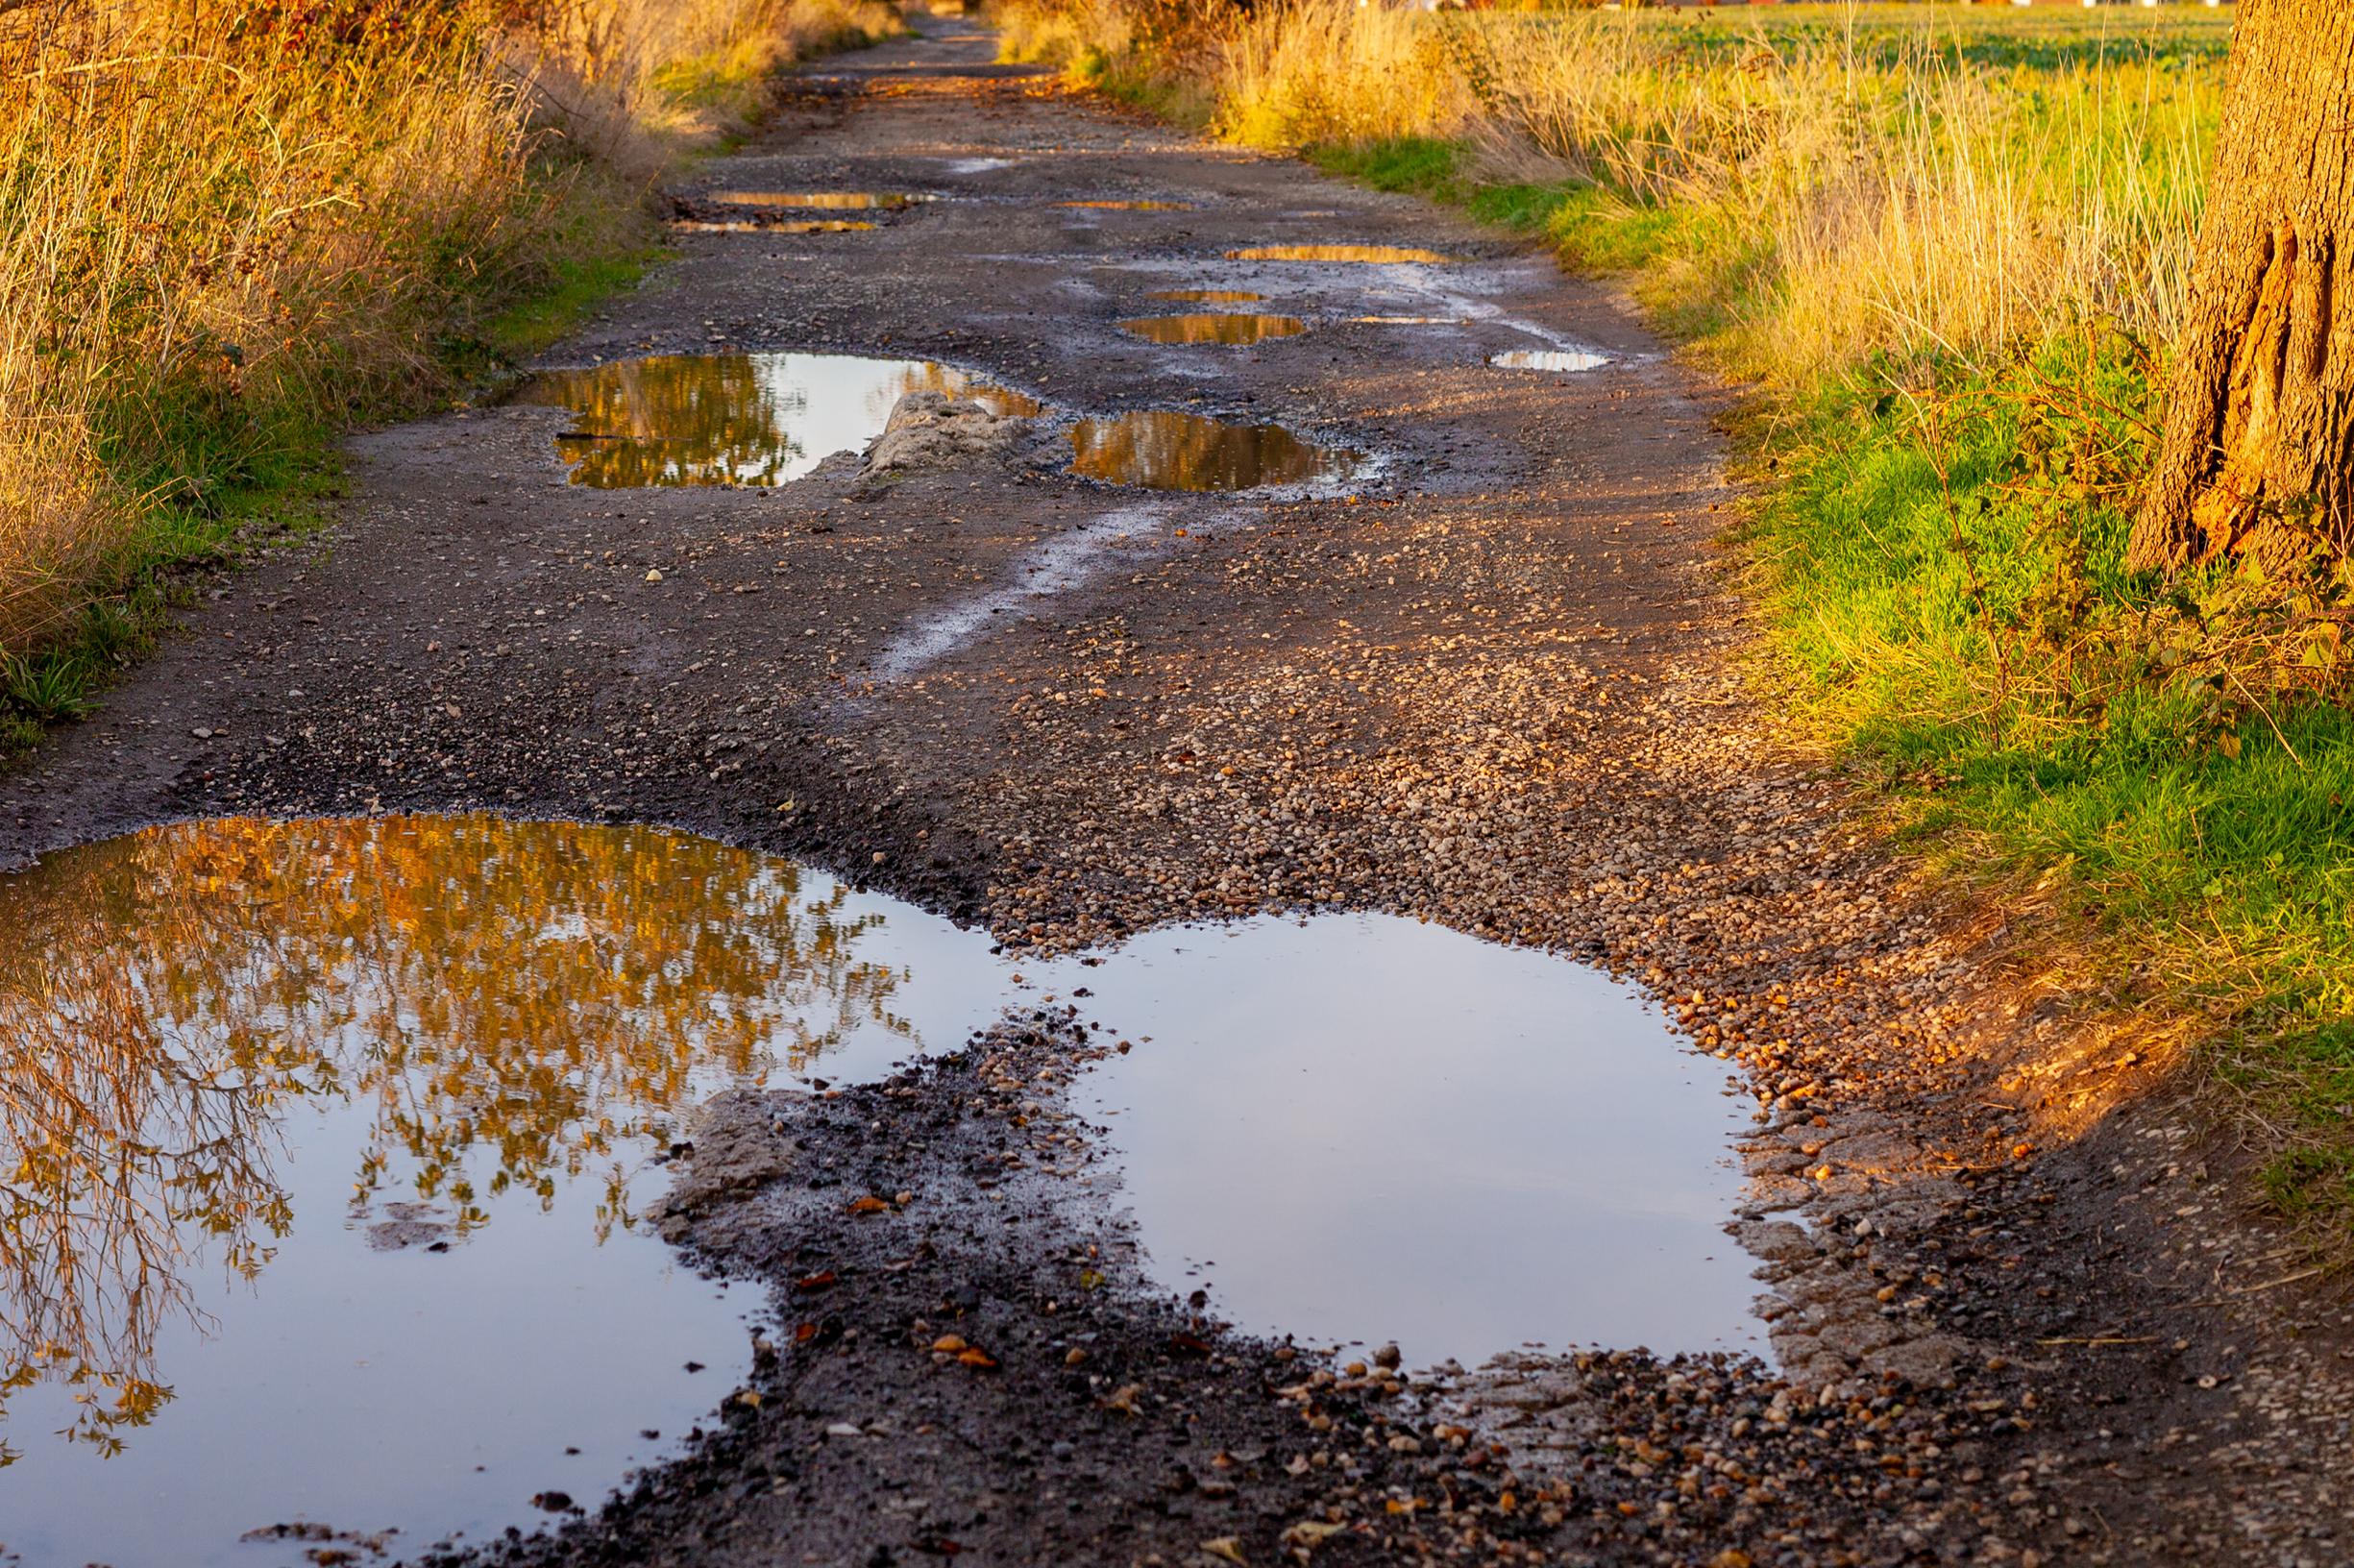 image of road full of potholes